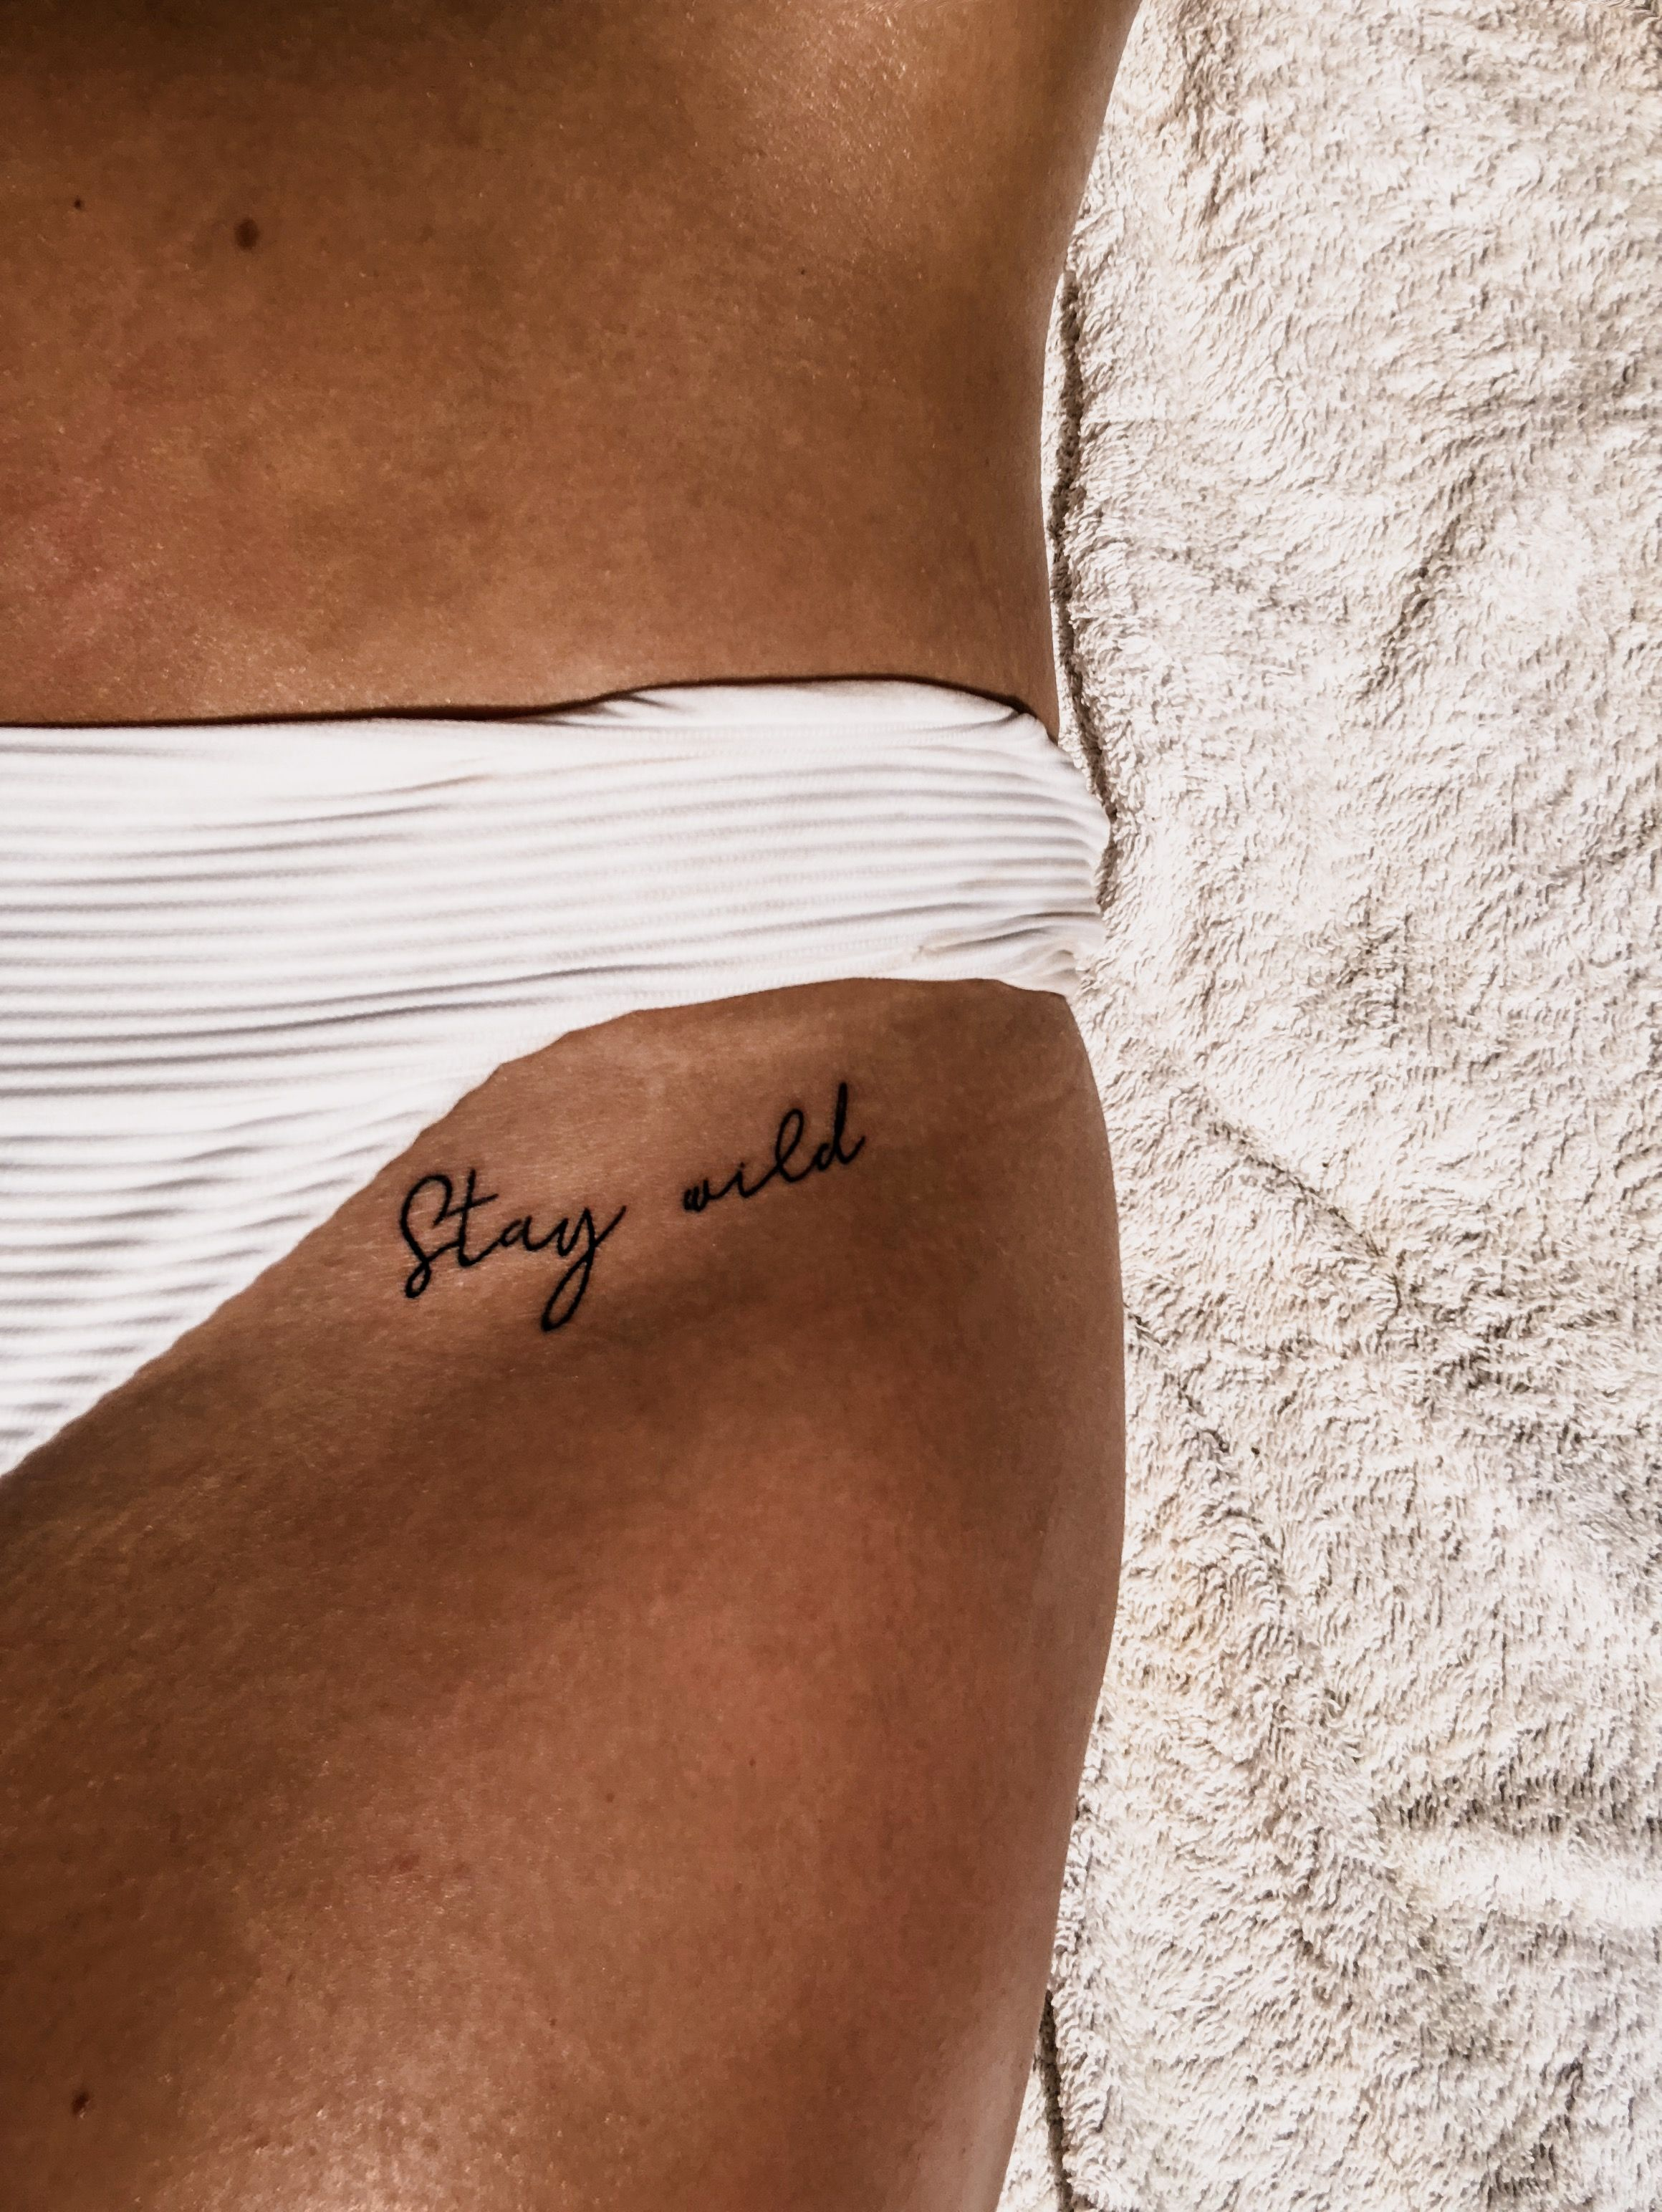 Photo of Stay wild tattoo